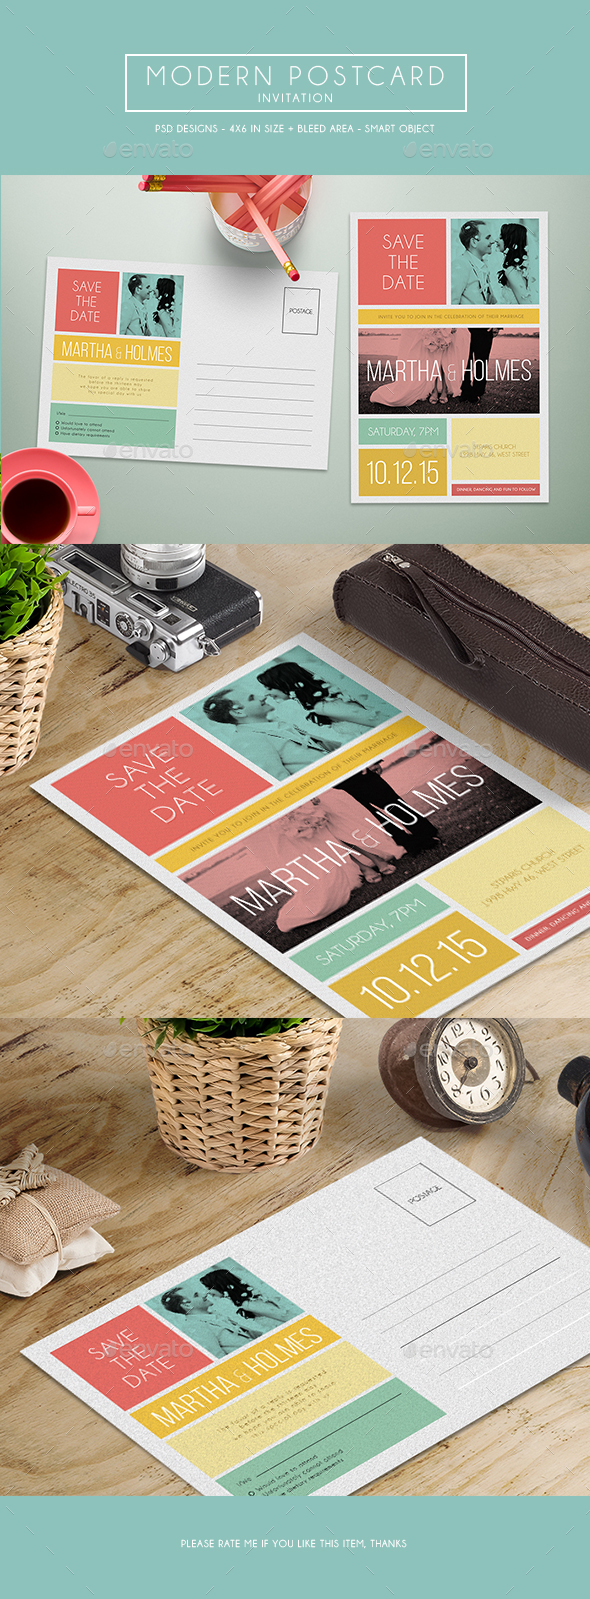 Modern Postcard Invitation - Invitations Cards & Invites